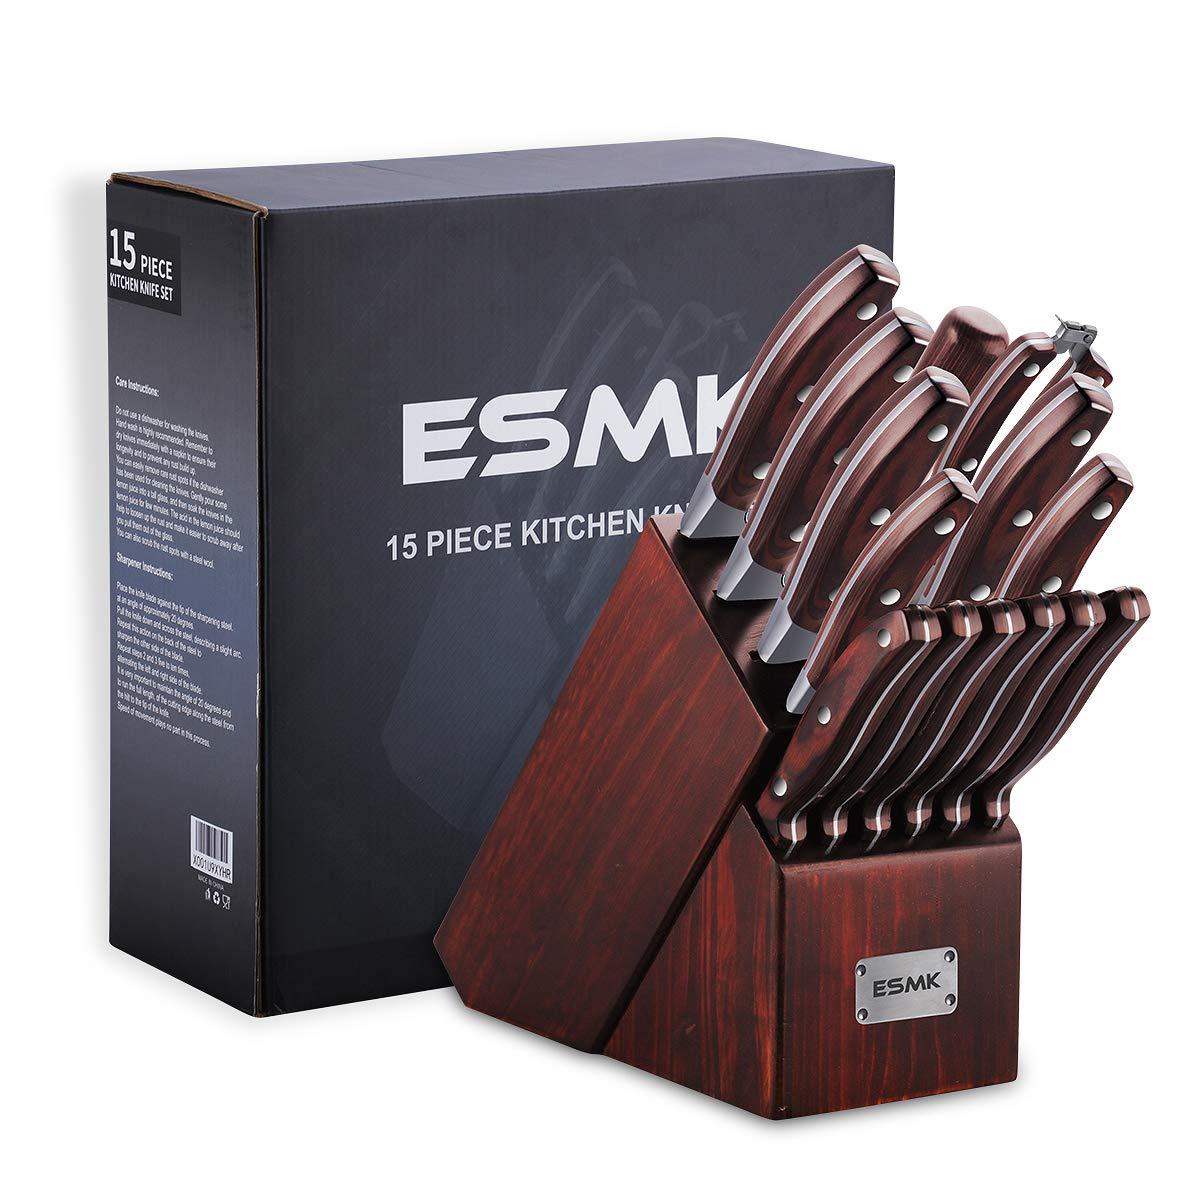 Knife Set, 15-Piece Kitchen Knife Set with Block Wooden, Manual Sharpening for Chef Knife Block Set, German Stainless Steel, ESMK (15 PCs Knife Block Set) by ESMK (Image #10)